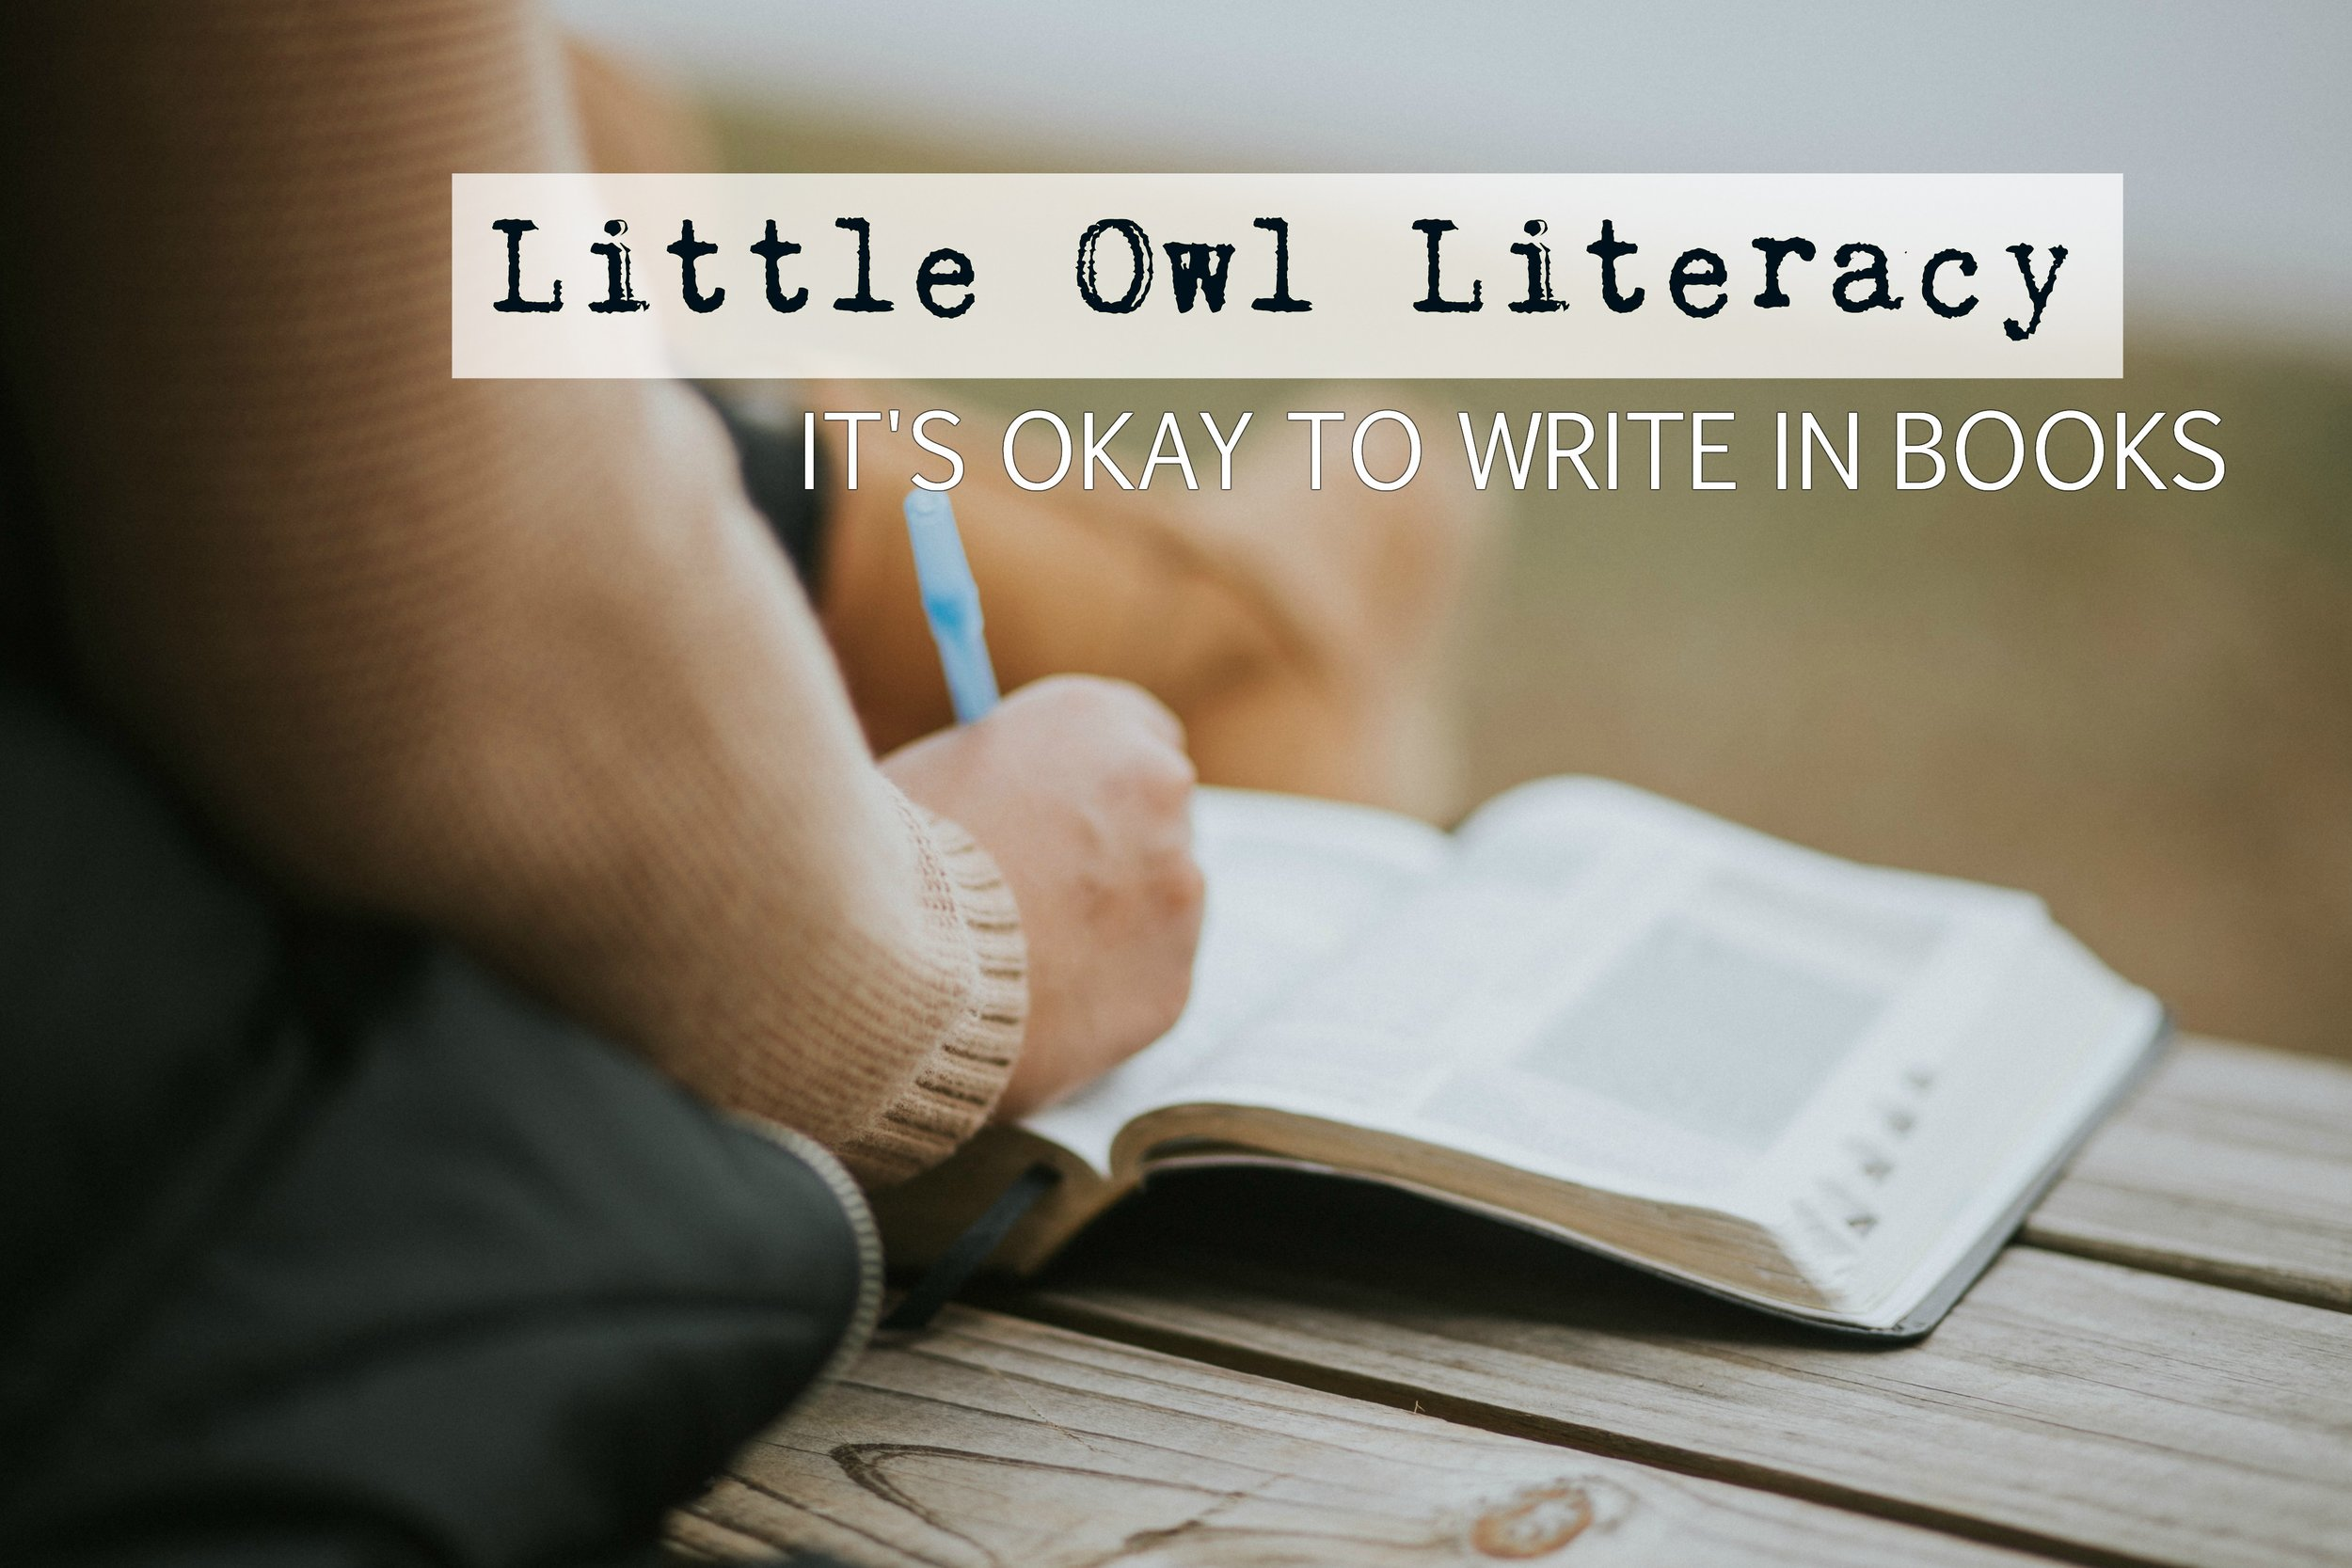 littleowl-writeinbooks.jpg